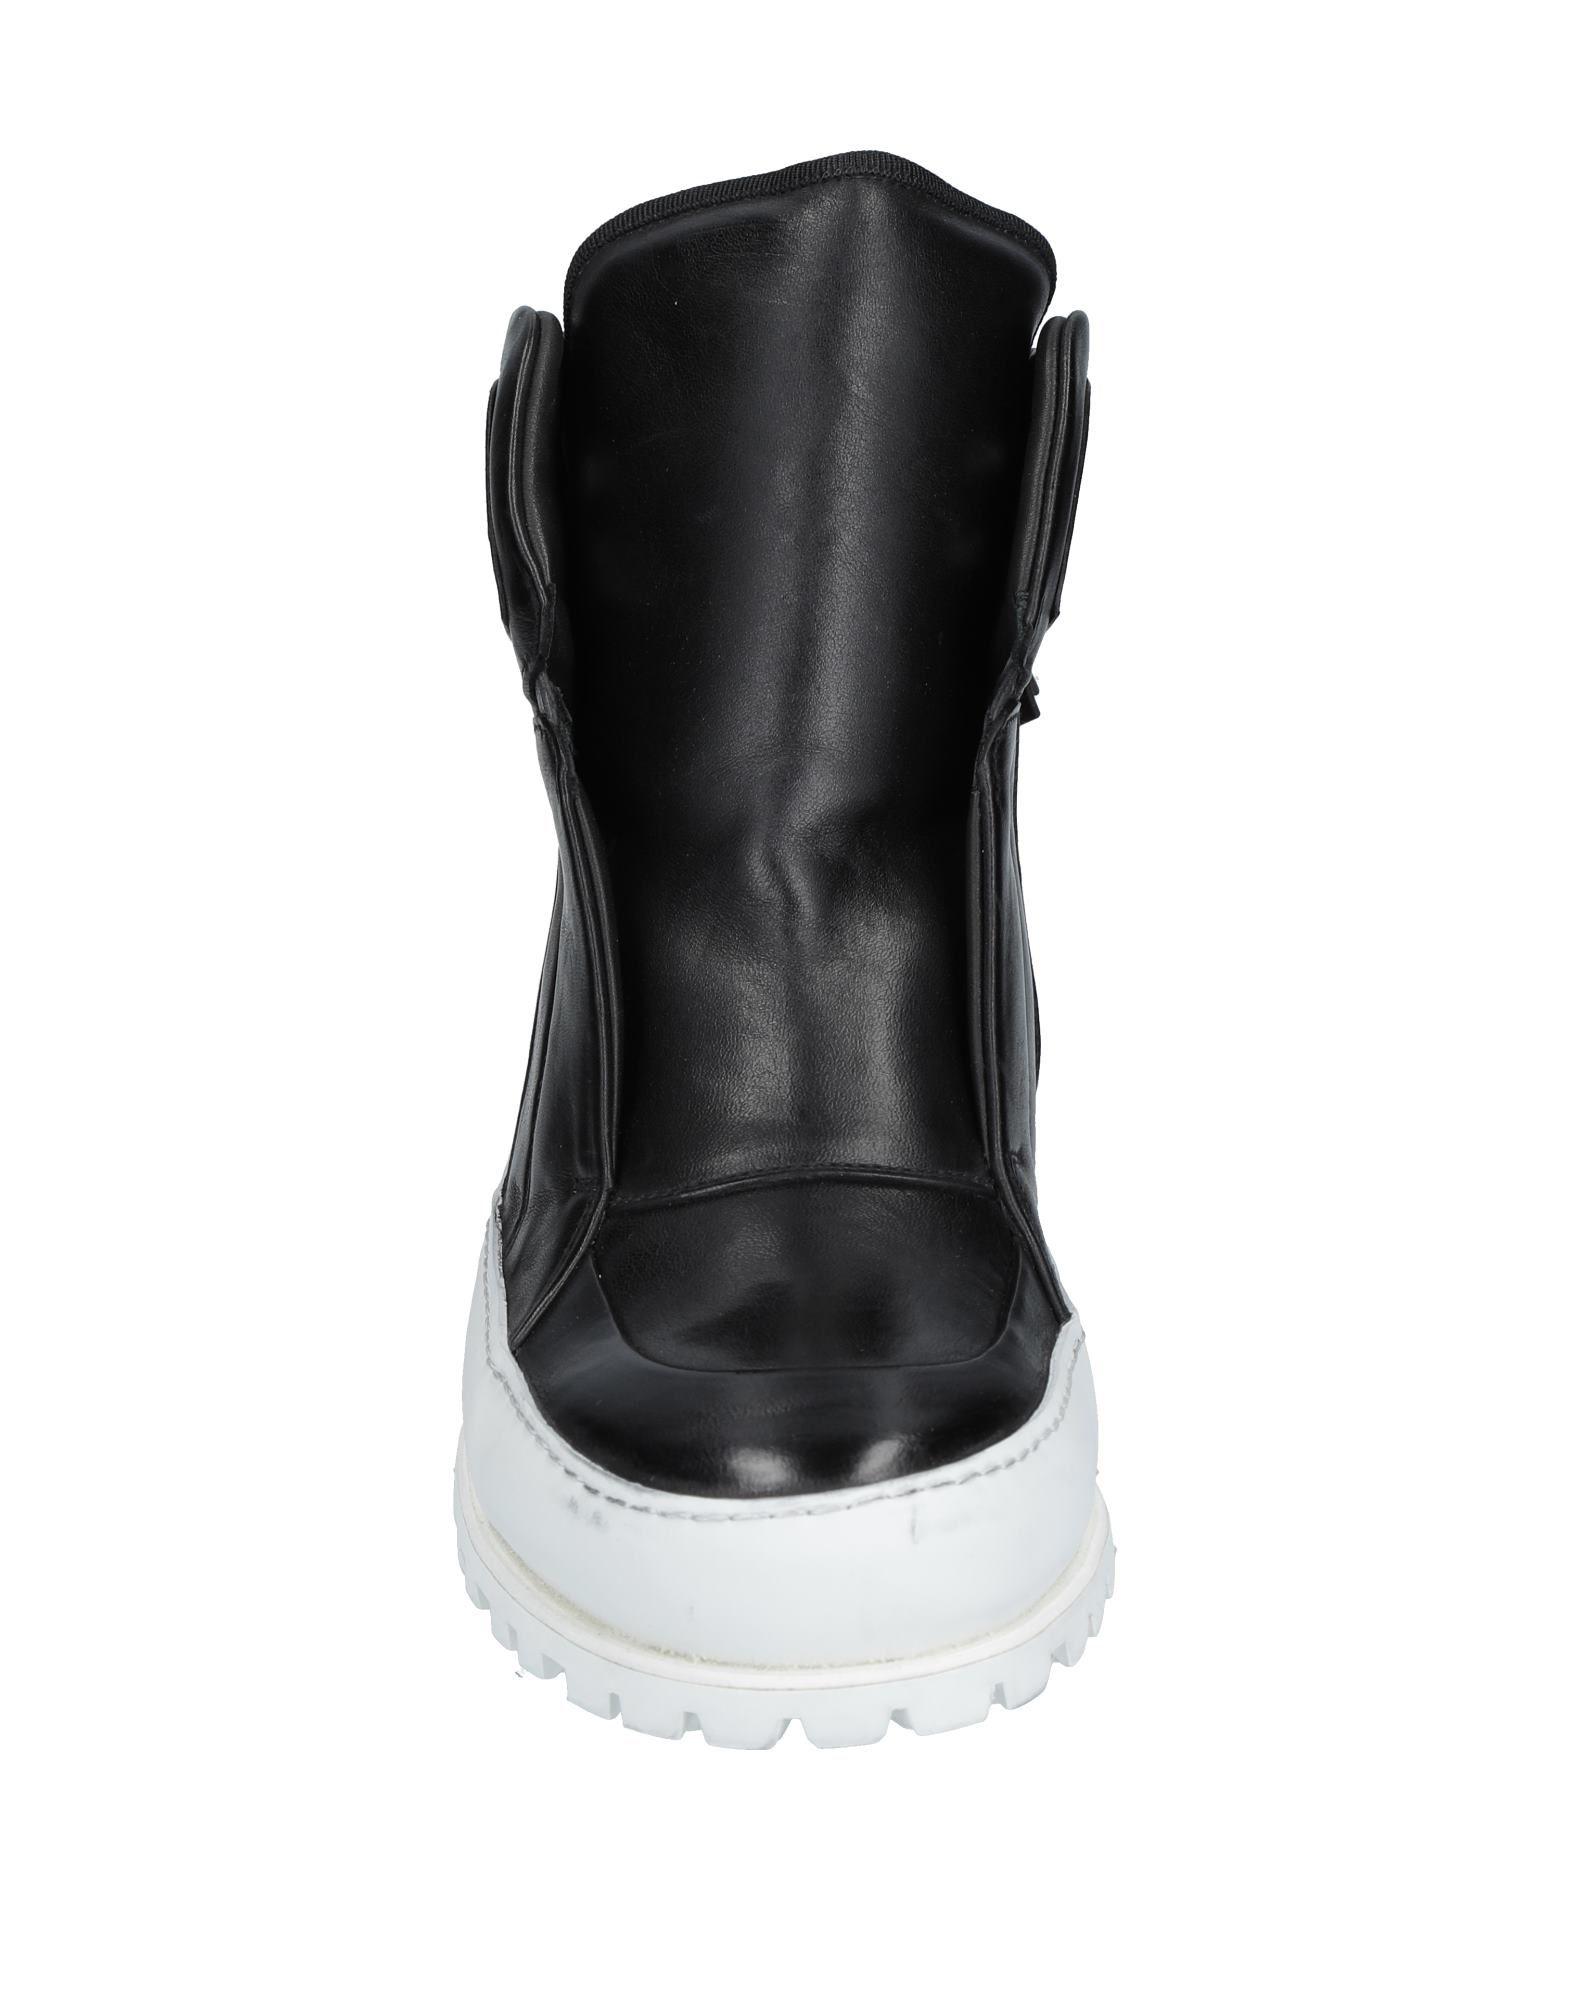 11528606SX Premiata Sneakers Herren  11528606SX  Heiße Schuhe db66d0